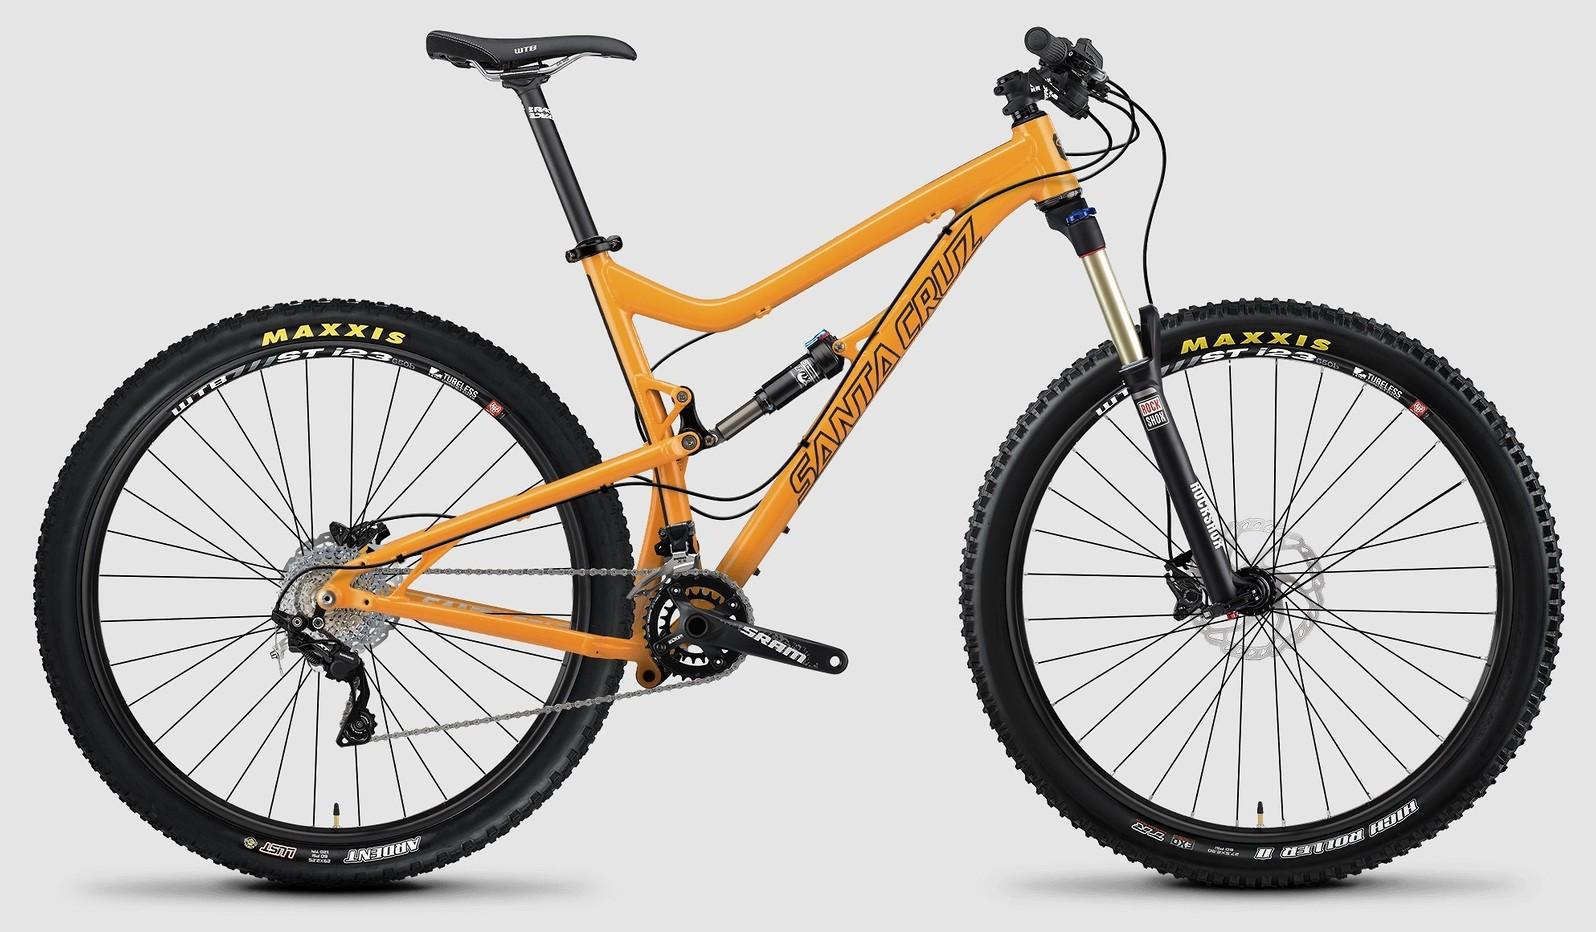 2015 Santa Cruz Tallboy LT Aluminum R bike